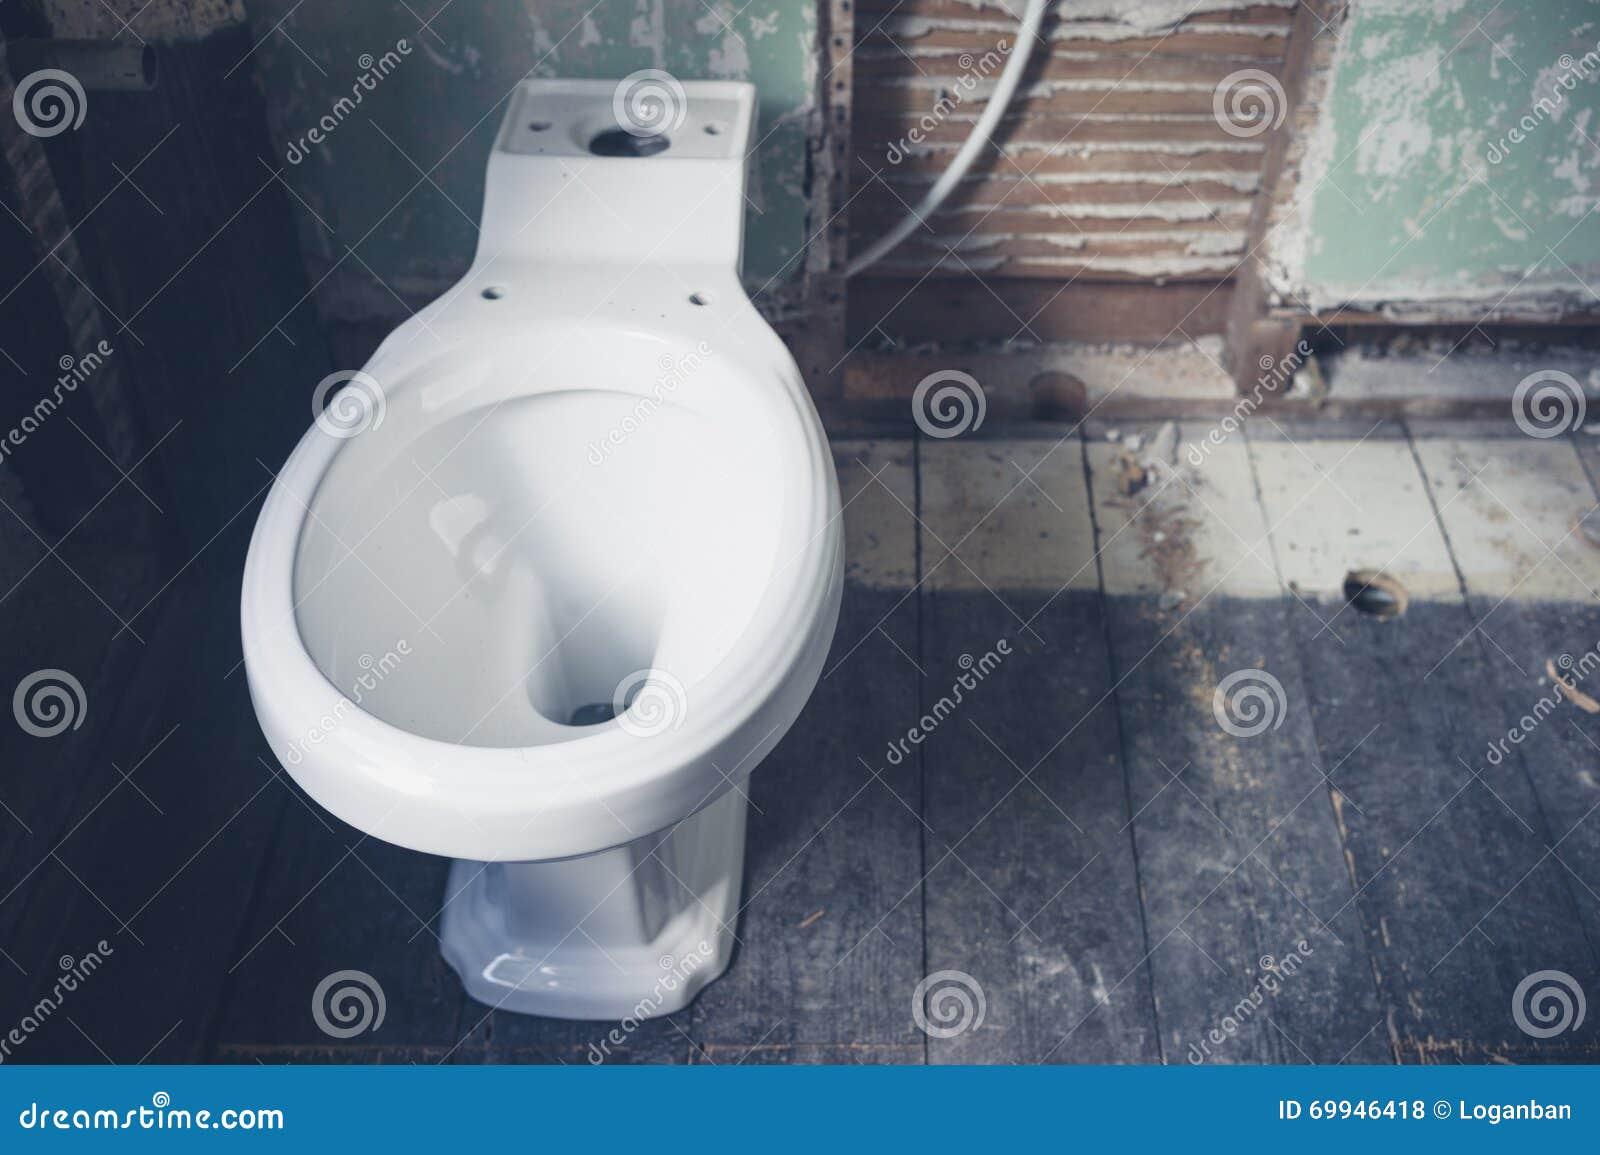 New Toilet In Derelict Bathroom Stock Photo - Image of renovation ...